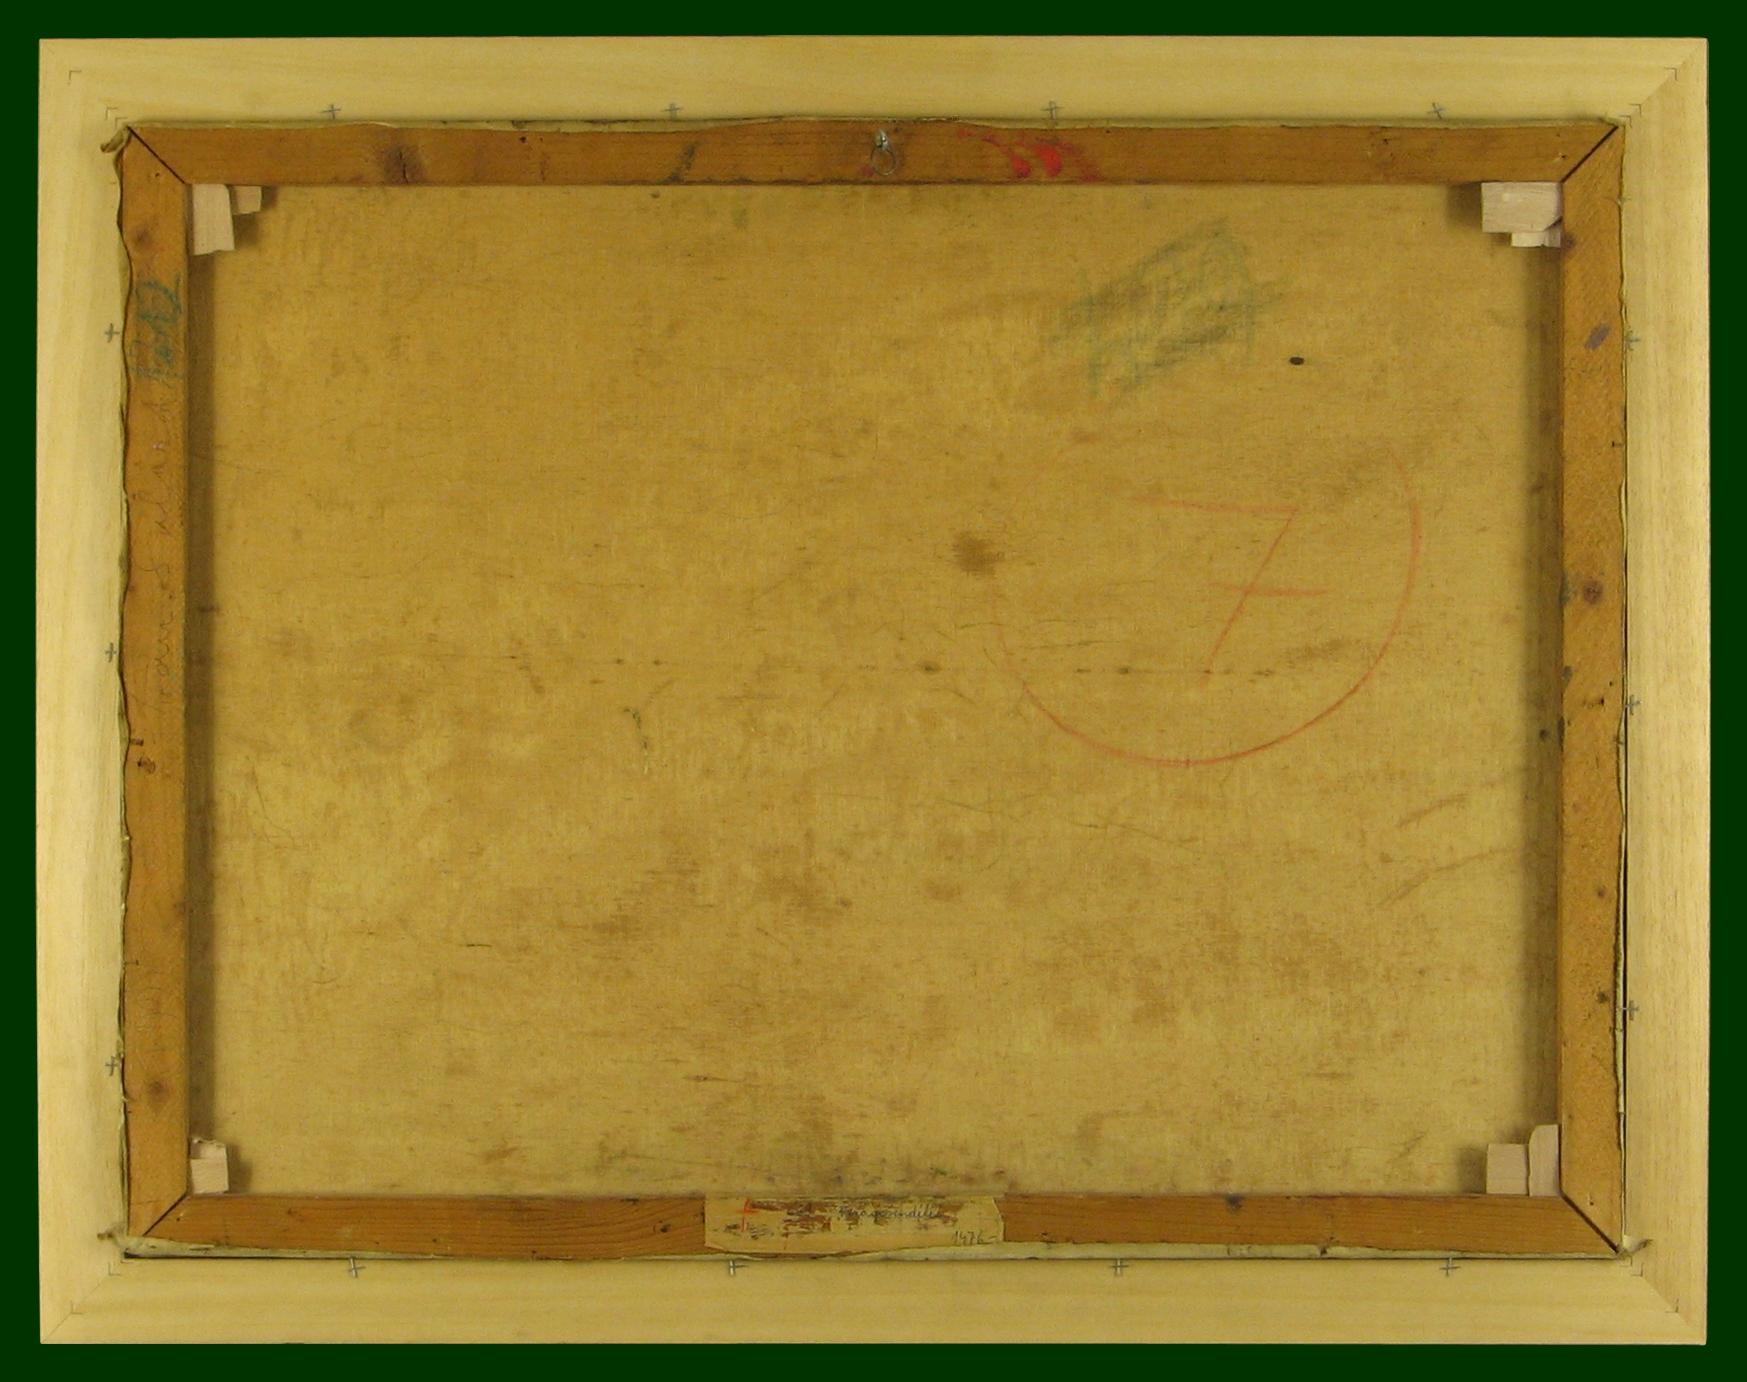 12-5h_t.jpg (1747�1382)